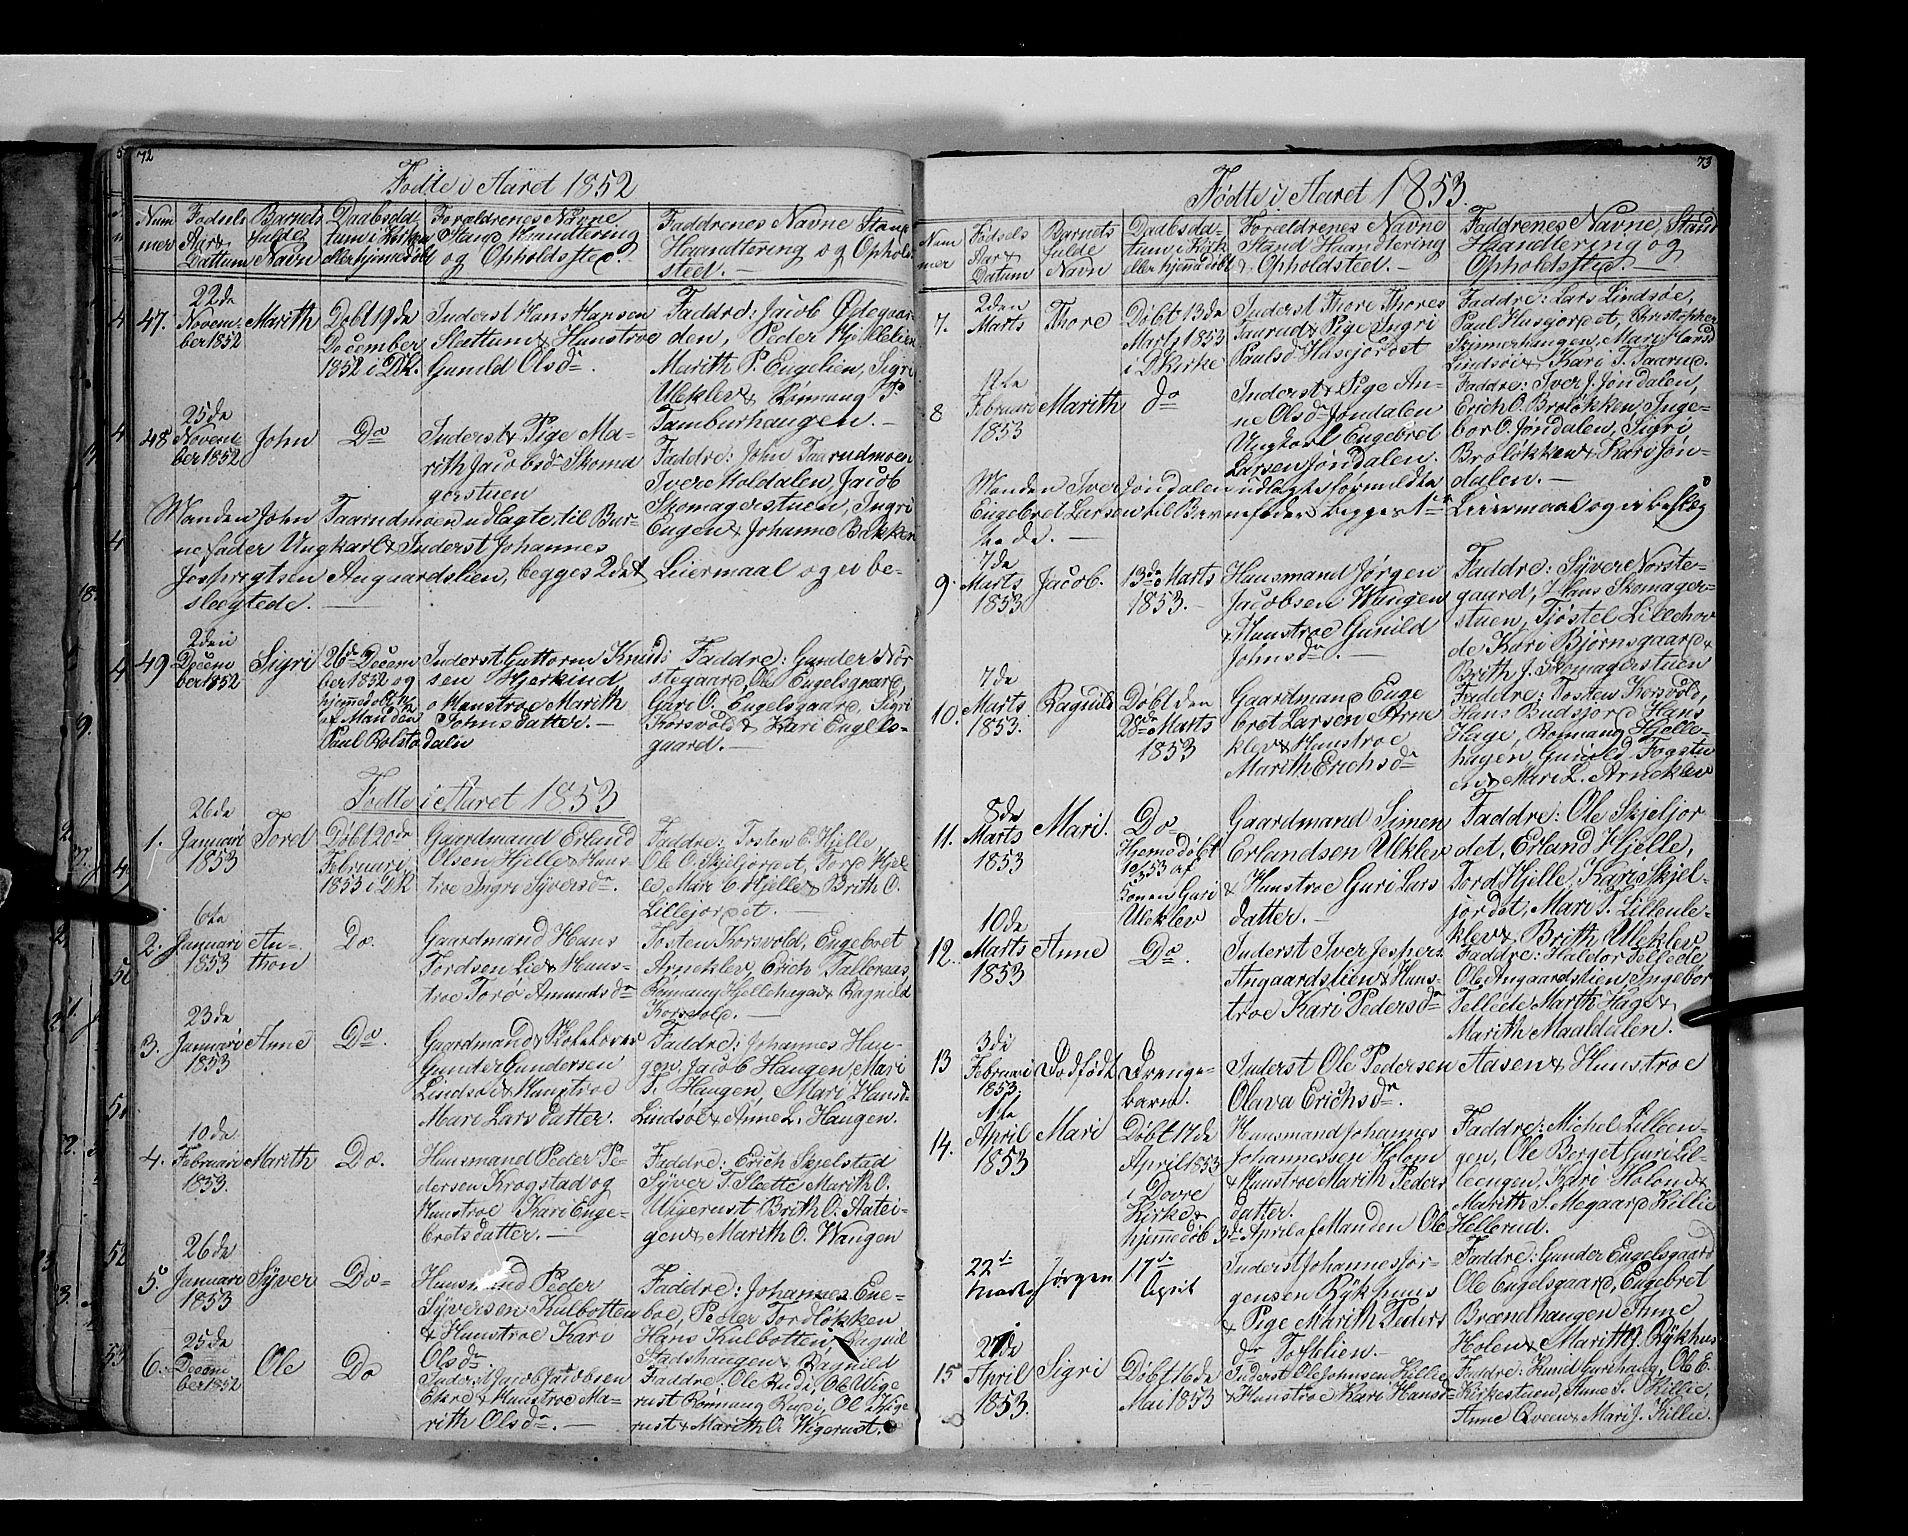 SAH, Lesja prestekontor, Klokkerbok nr. 3, 1842-1862, s. 72-73